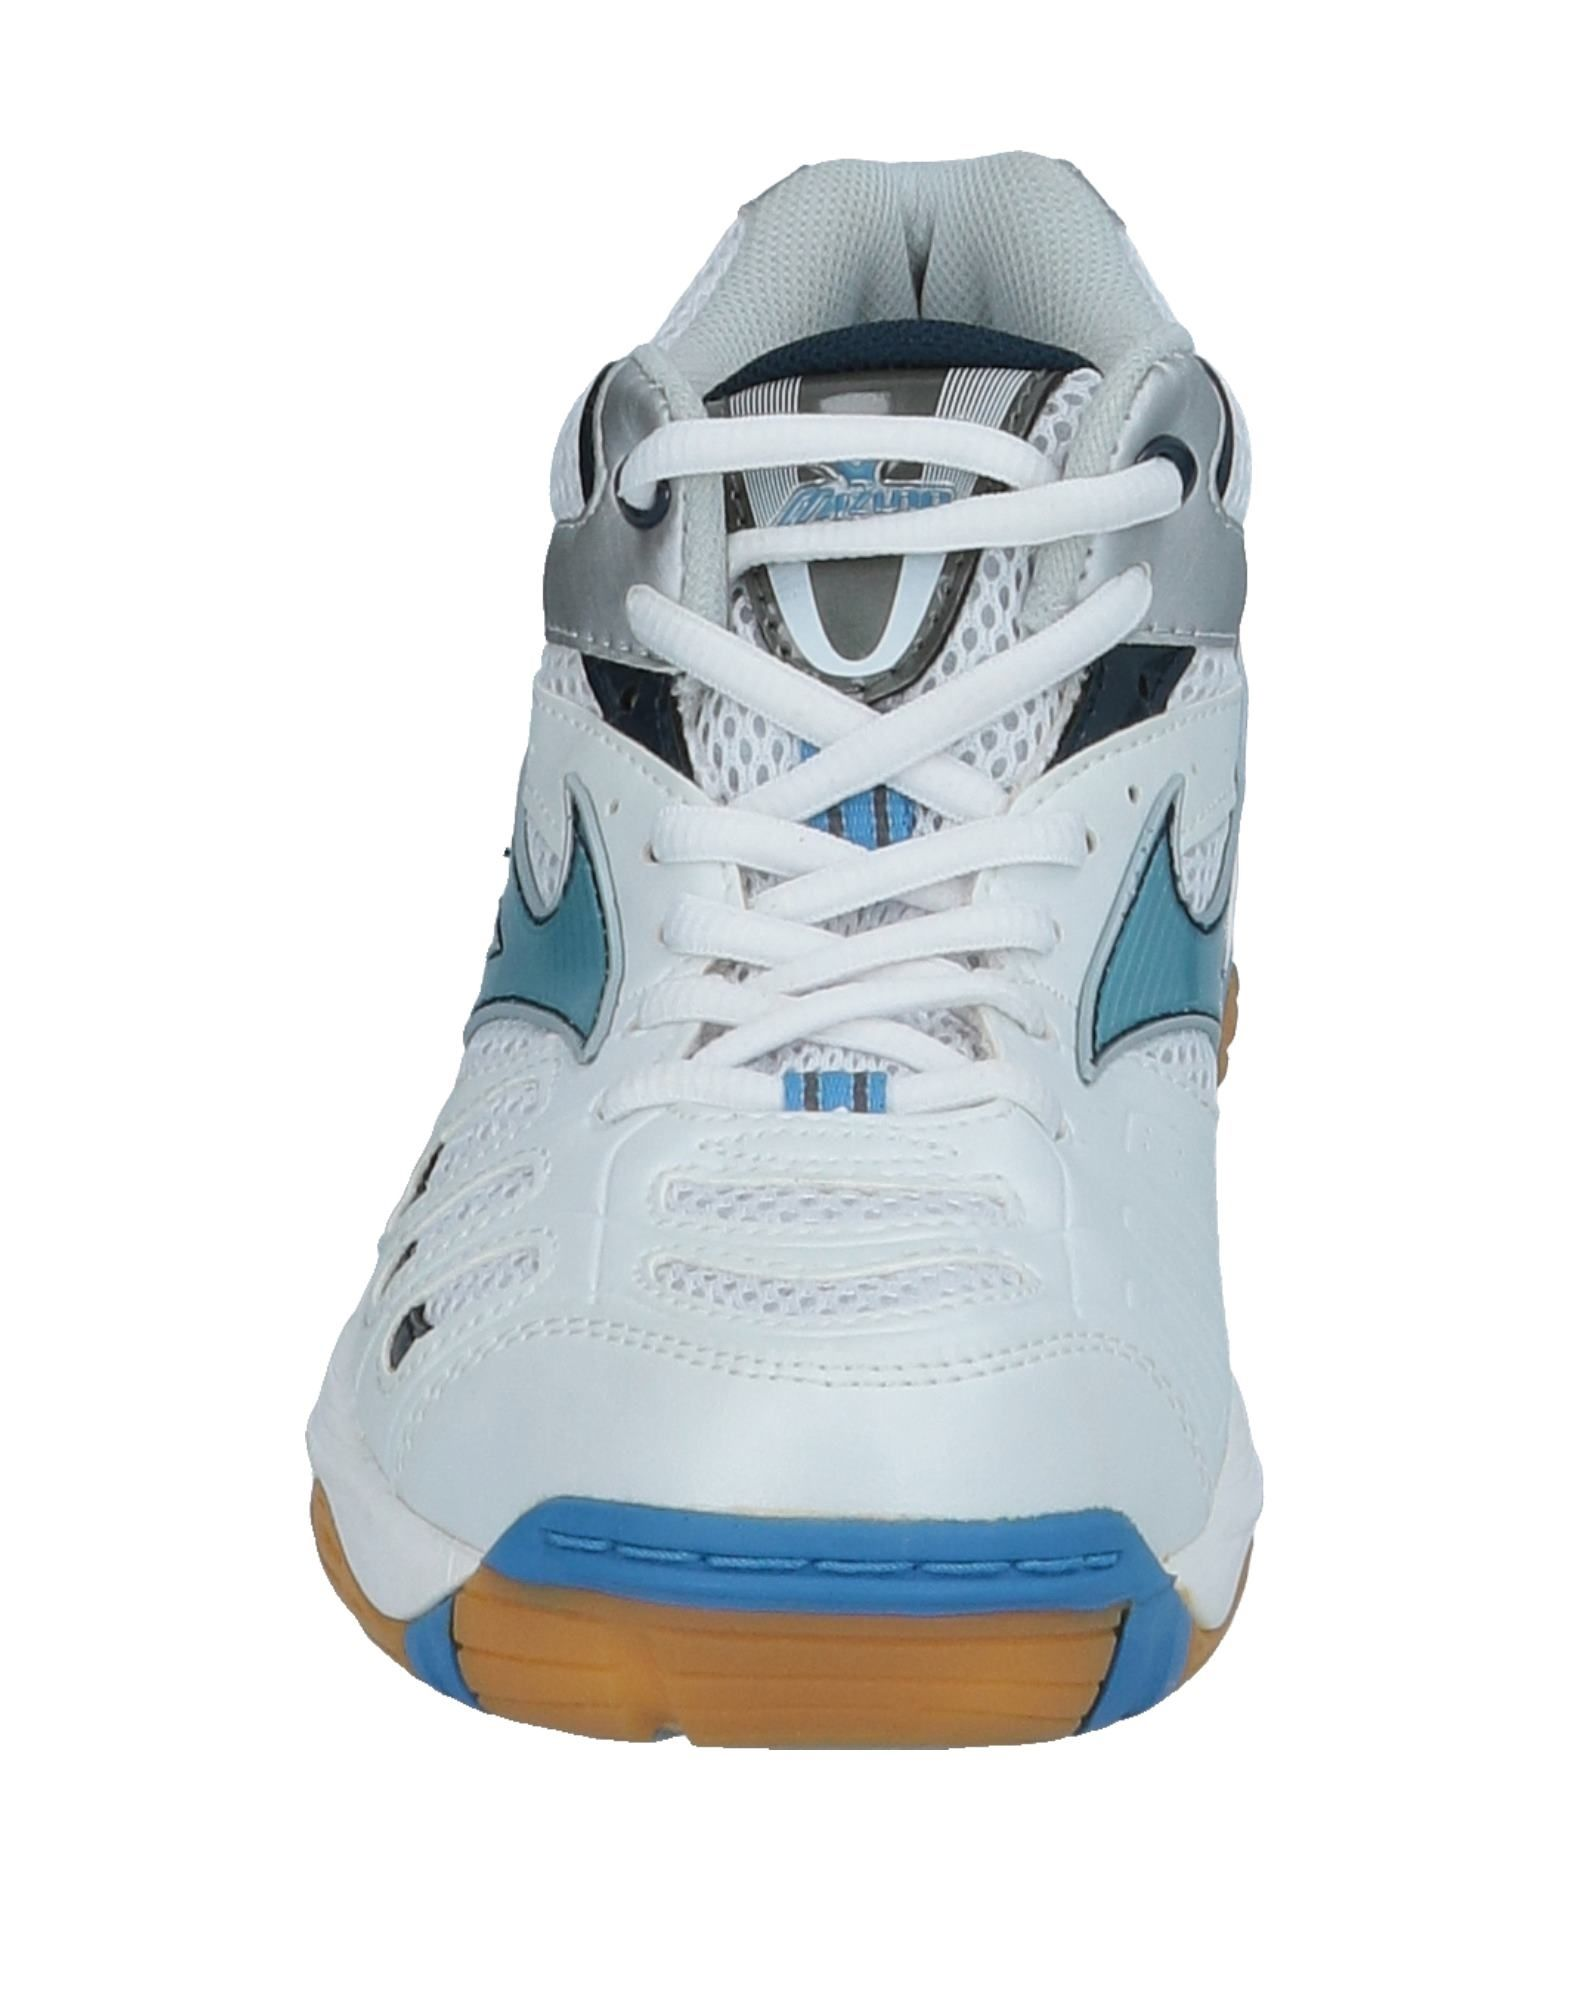 Mizuno Sneakers Damen  11538398LK 11538398LK   bea9c5